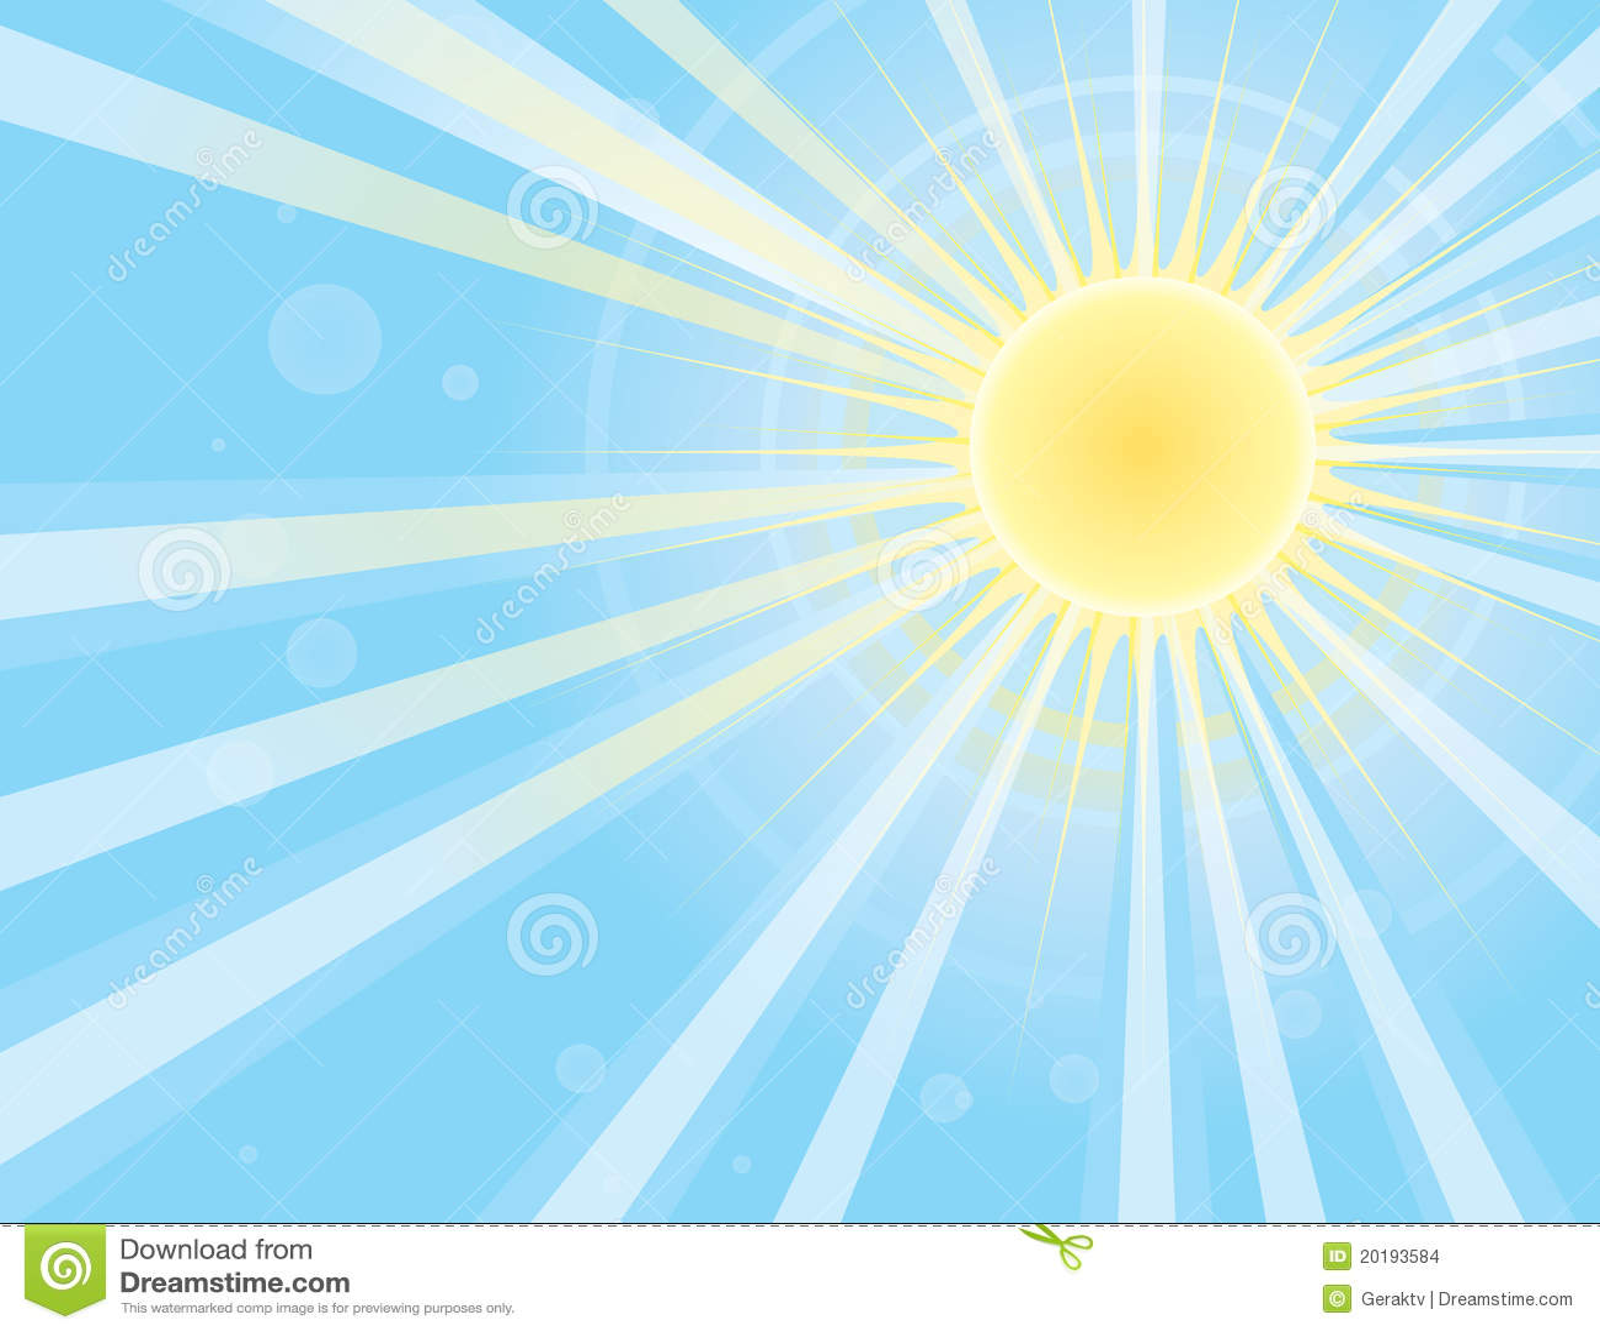 Sun rays in blue sky.Vector image